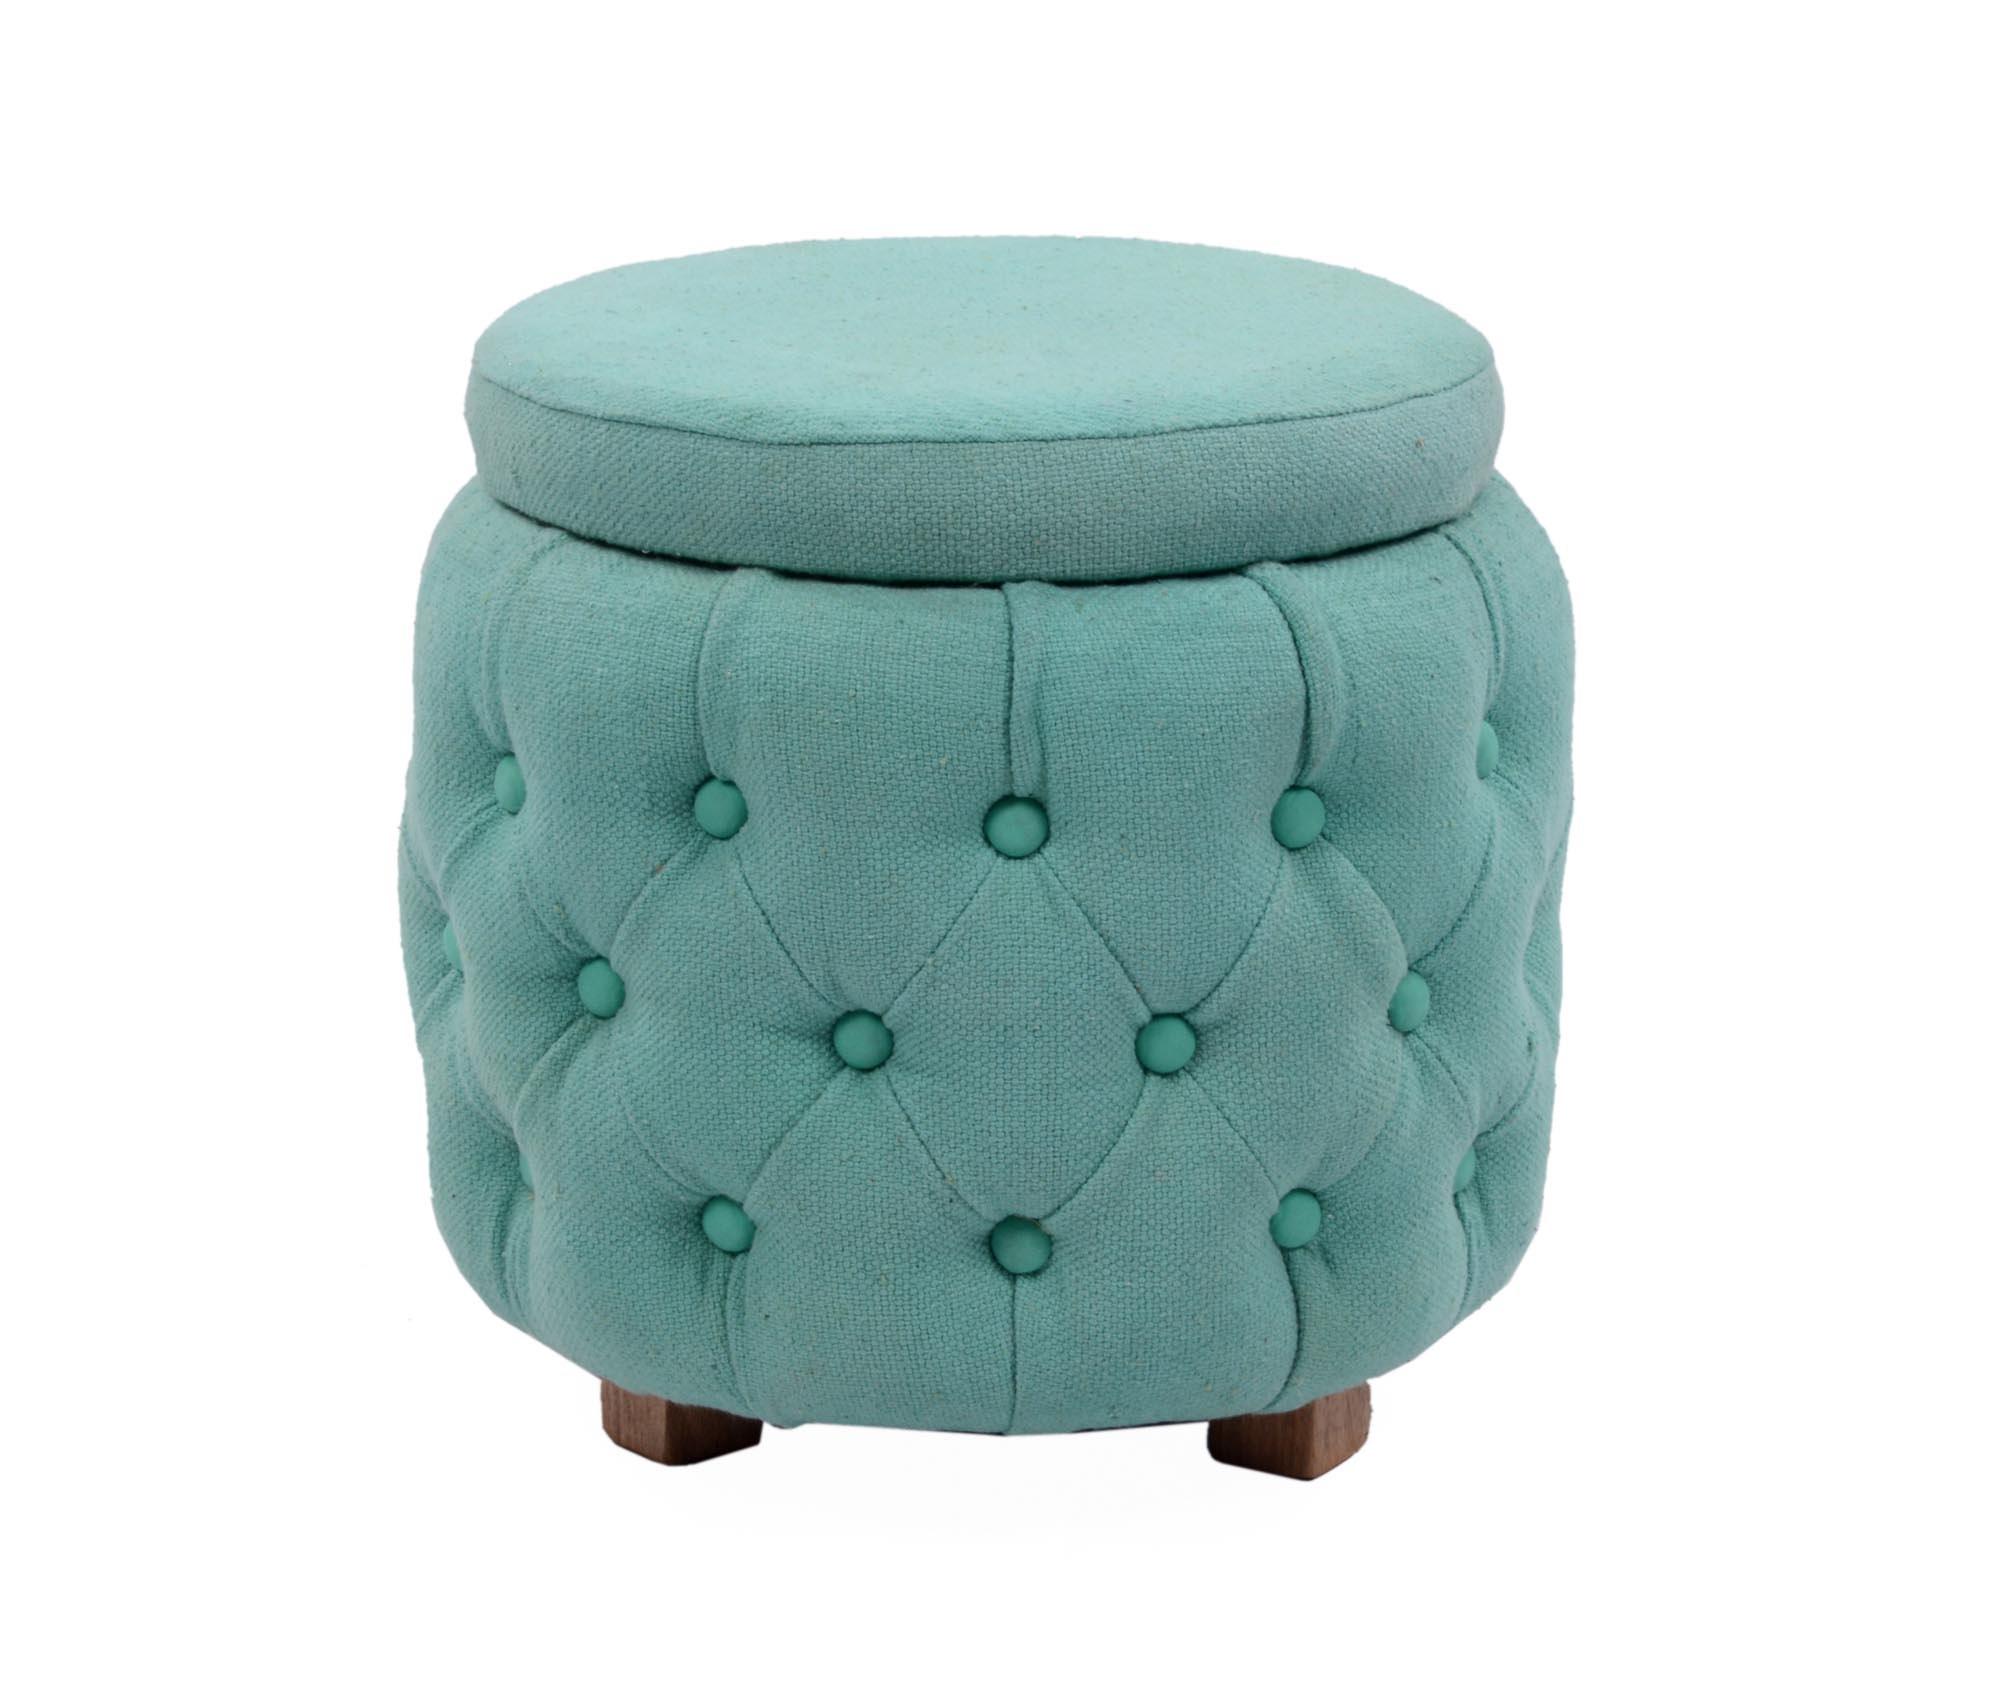 Fotos gratis : mesa, cabello, taburete, verde, mueble, peinado, sofá ...